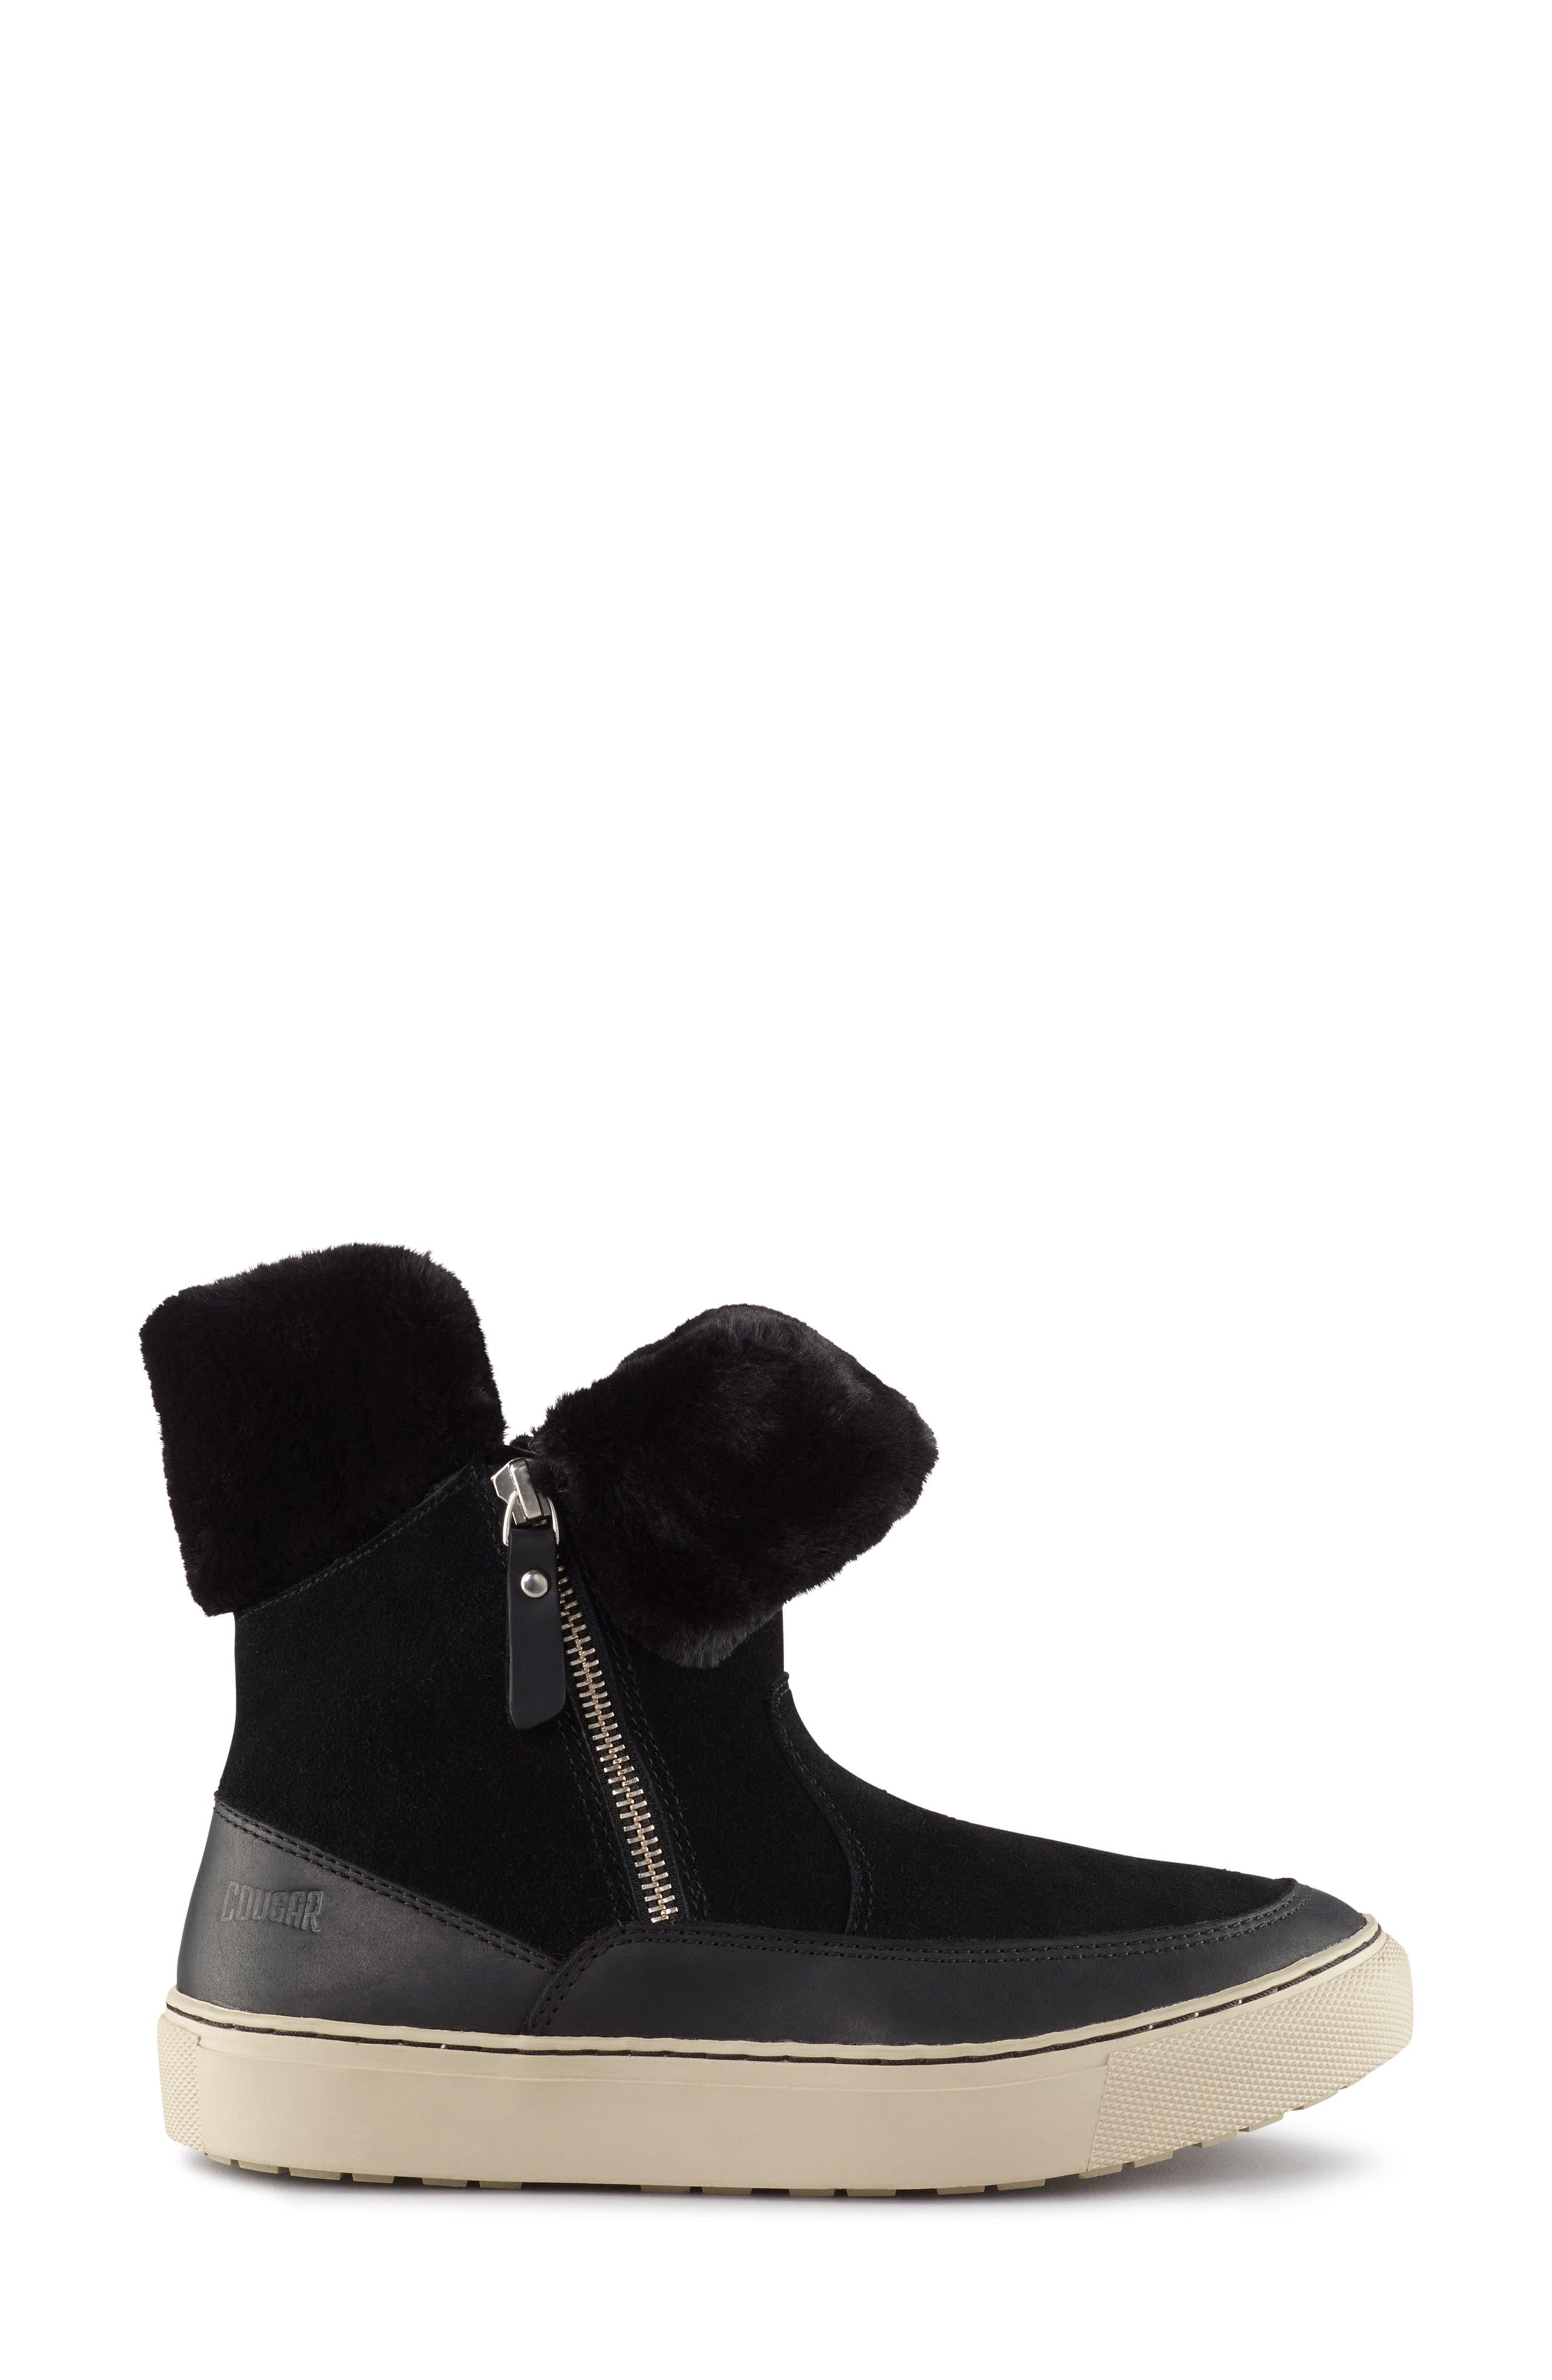 Dresden Waterproof Sneaker Boot with Faux Fur Trim,                             Alternate thumbnail 7, color,                             001